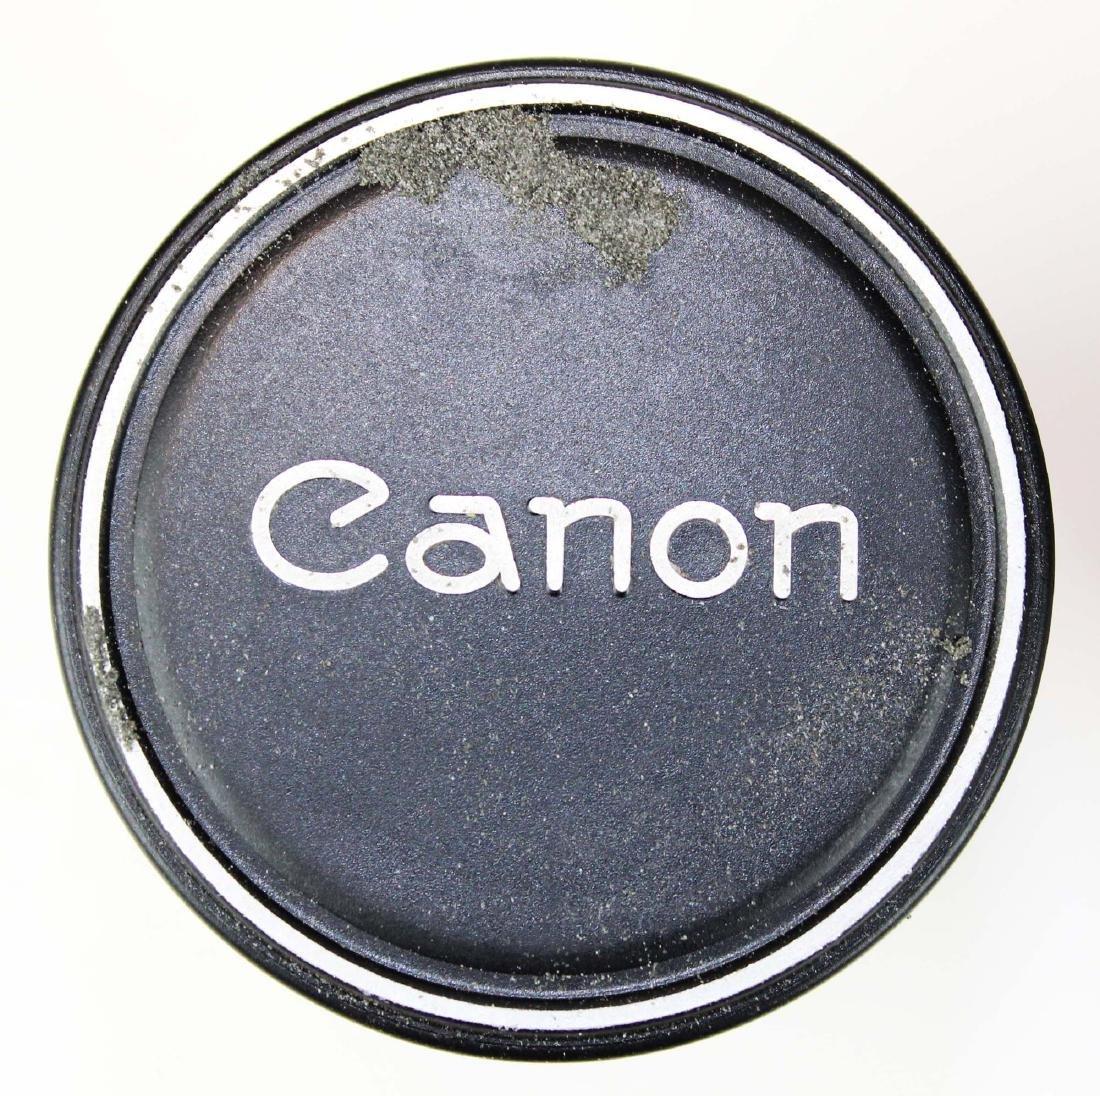 Pellix Cannon No. 177110 - 3